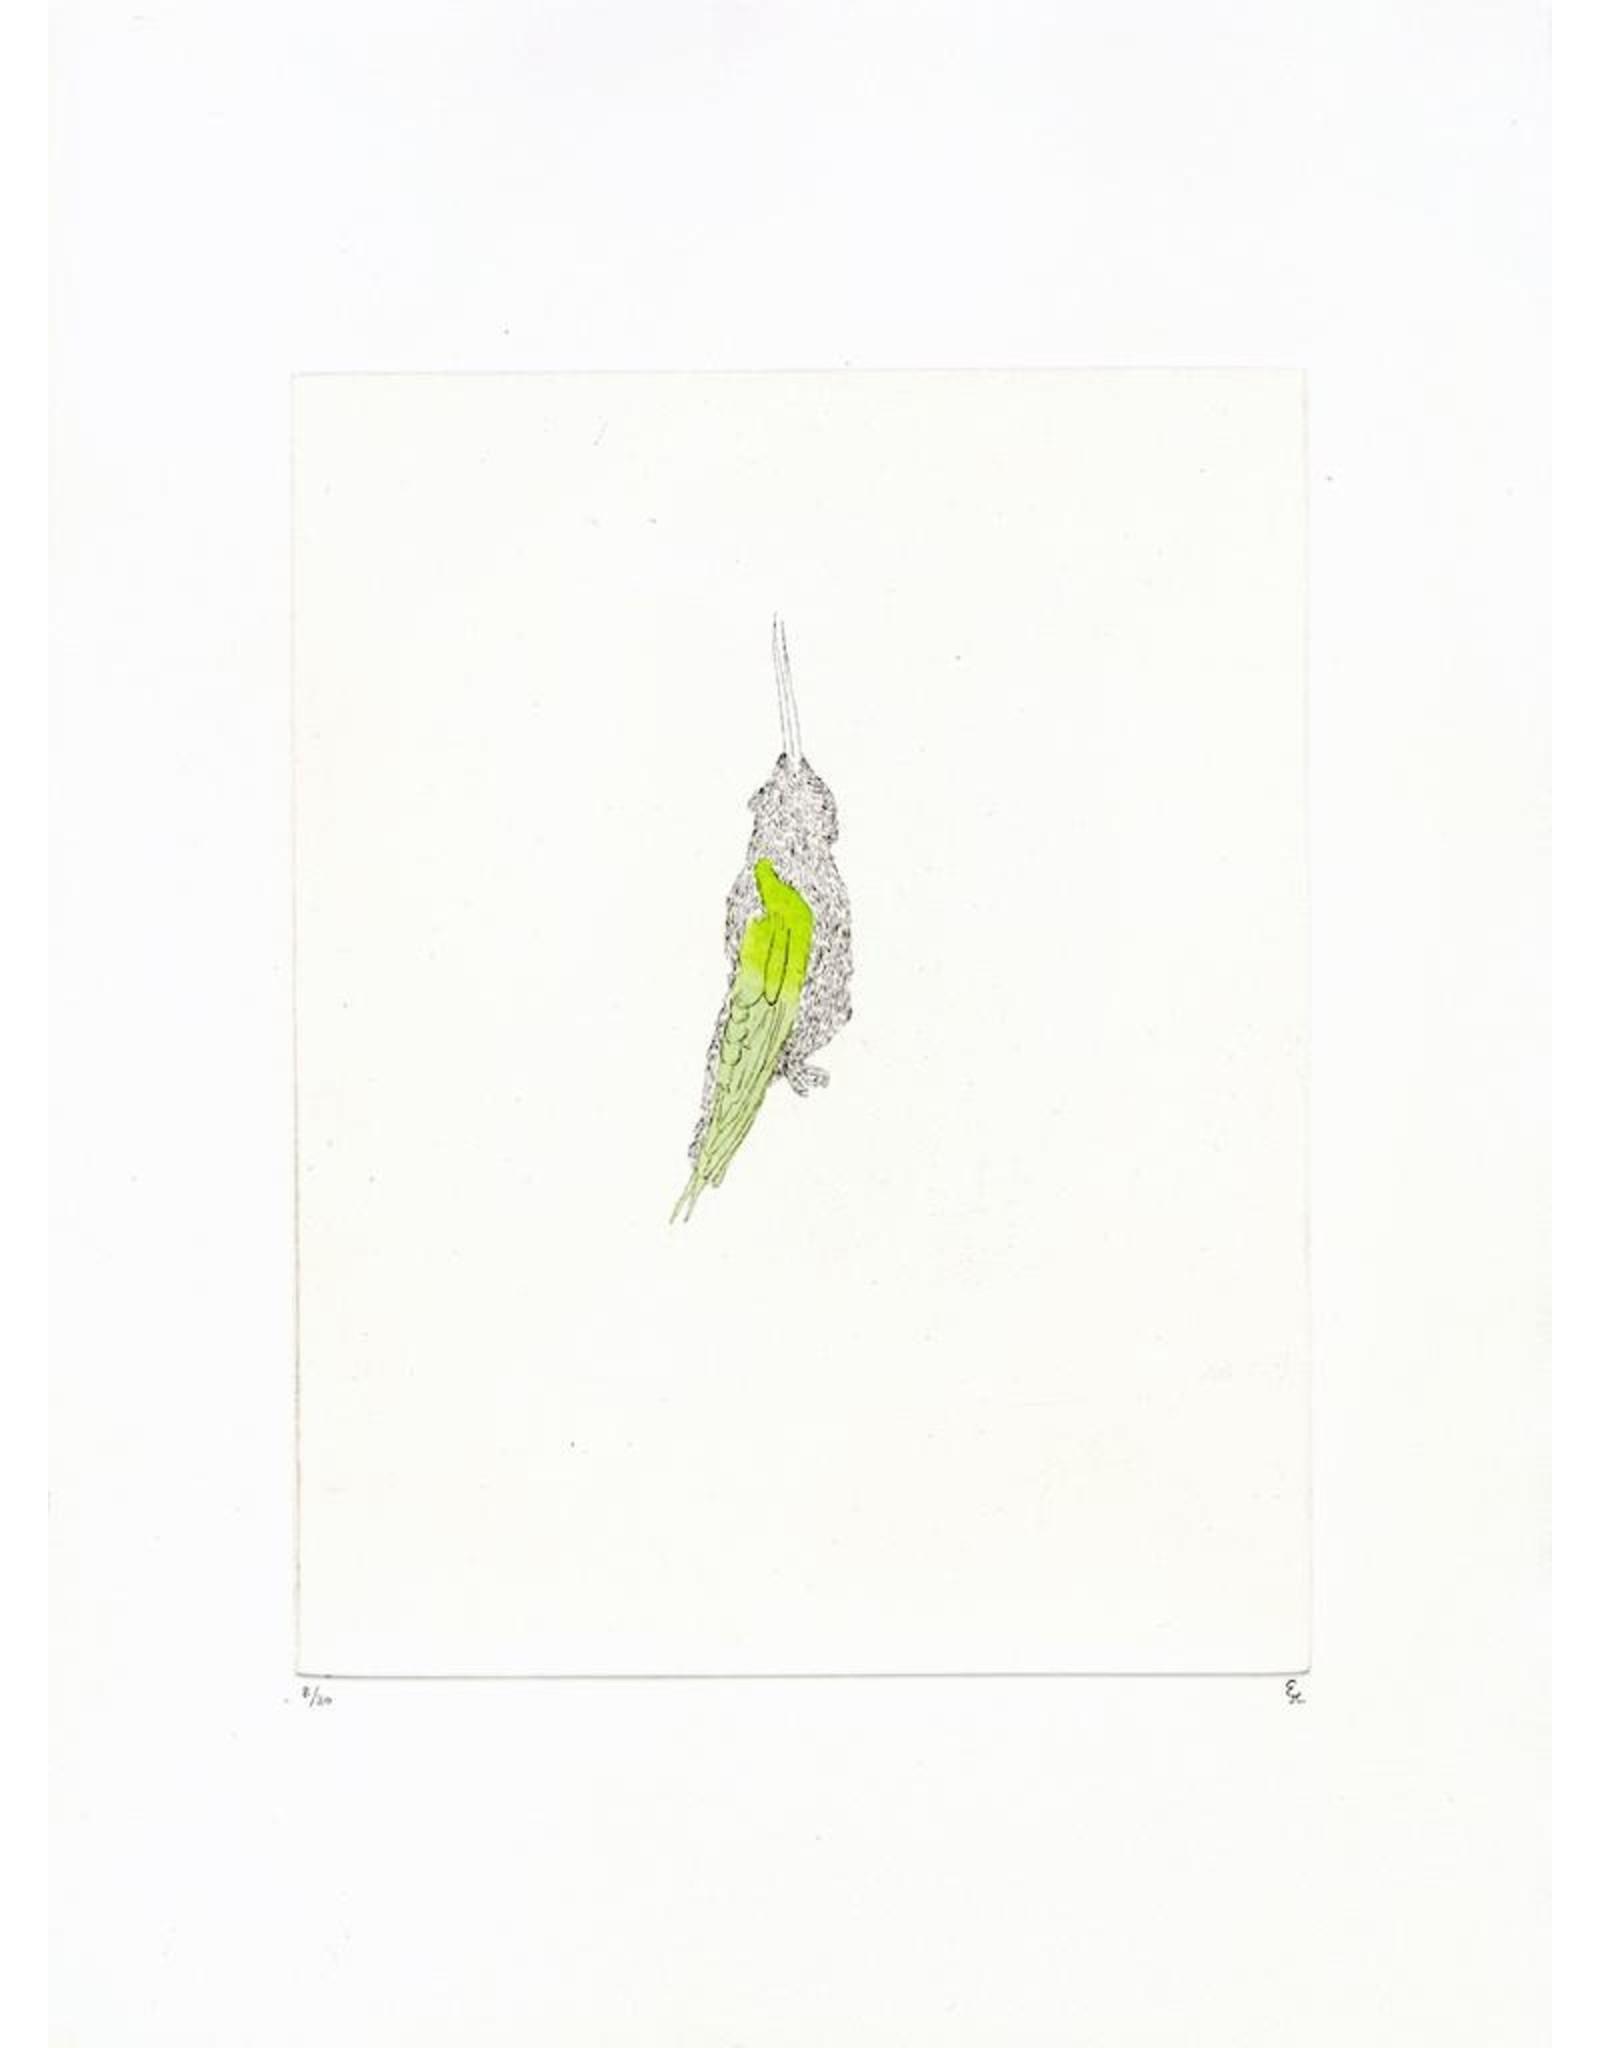 Josephson-Laidlaw, Erin Hummingbird (from Some Specimens series)